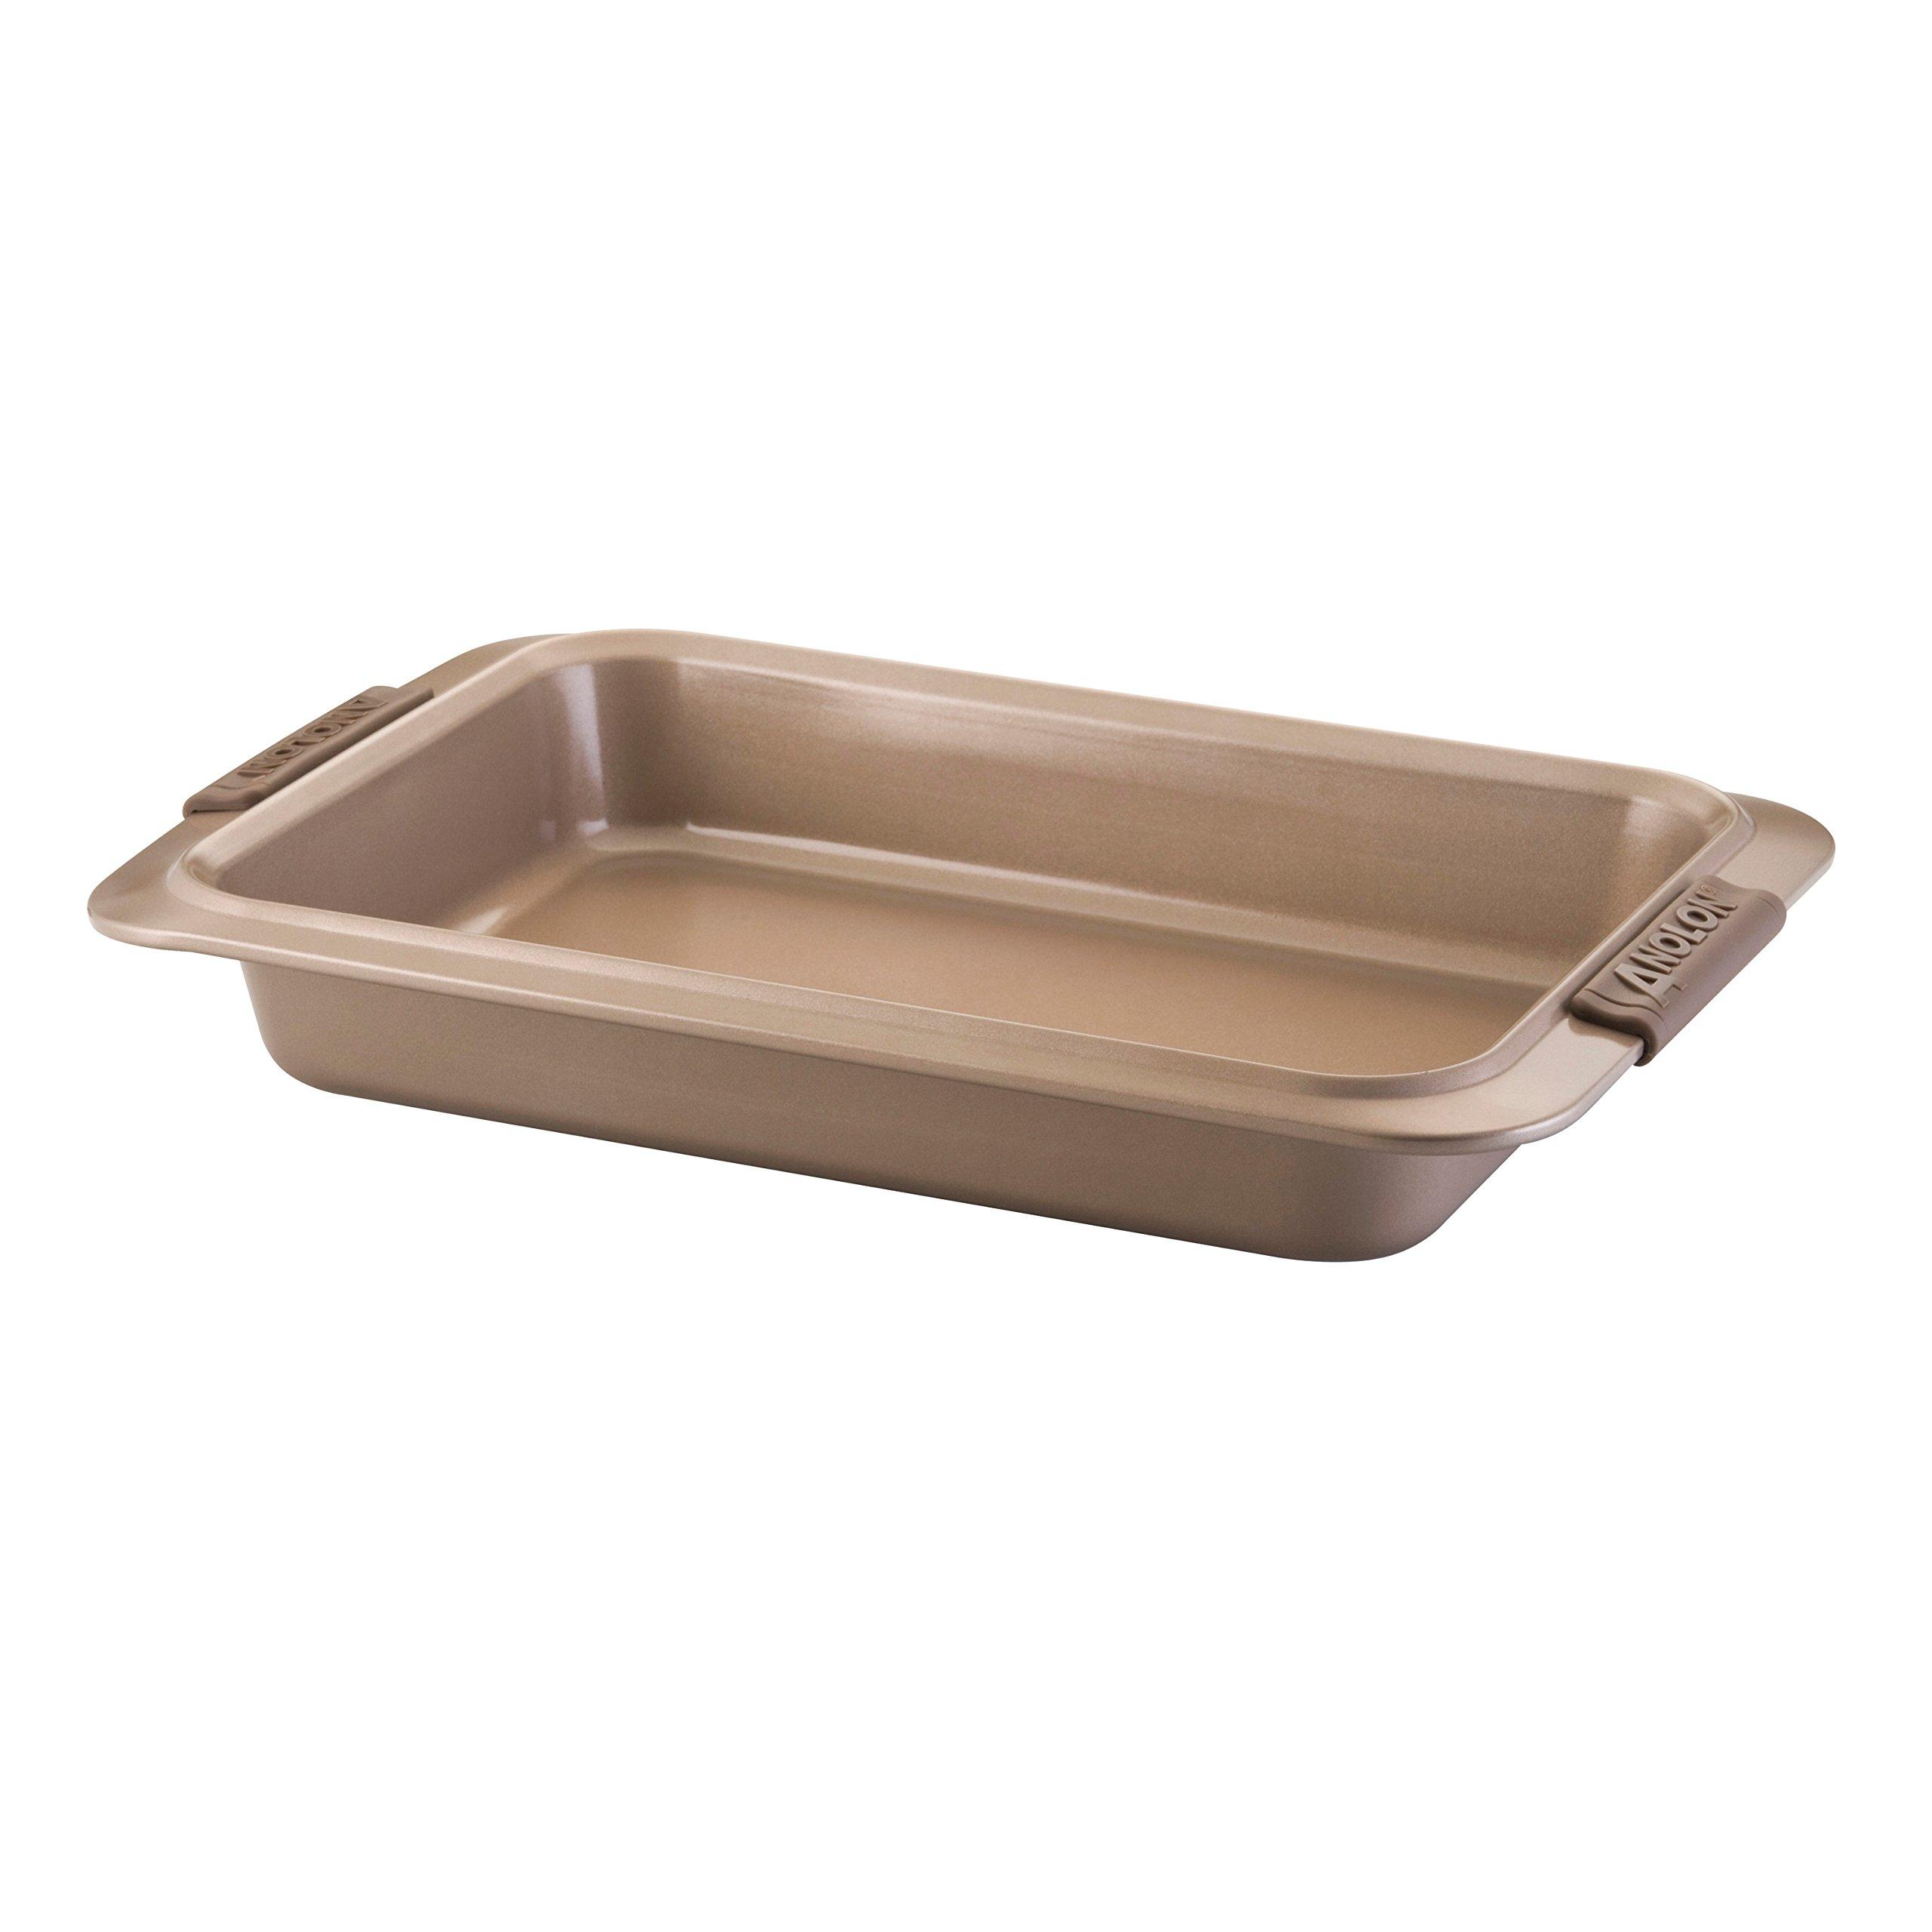 Anolon Advanced Bronze Nonstick Bakeware 9 by 13-Inch Rectangular Cake Pan by Anolon